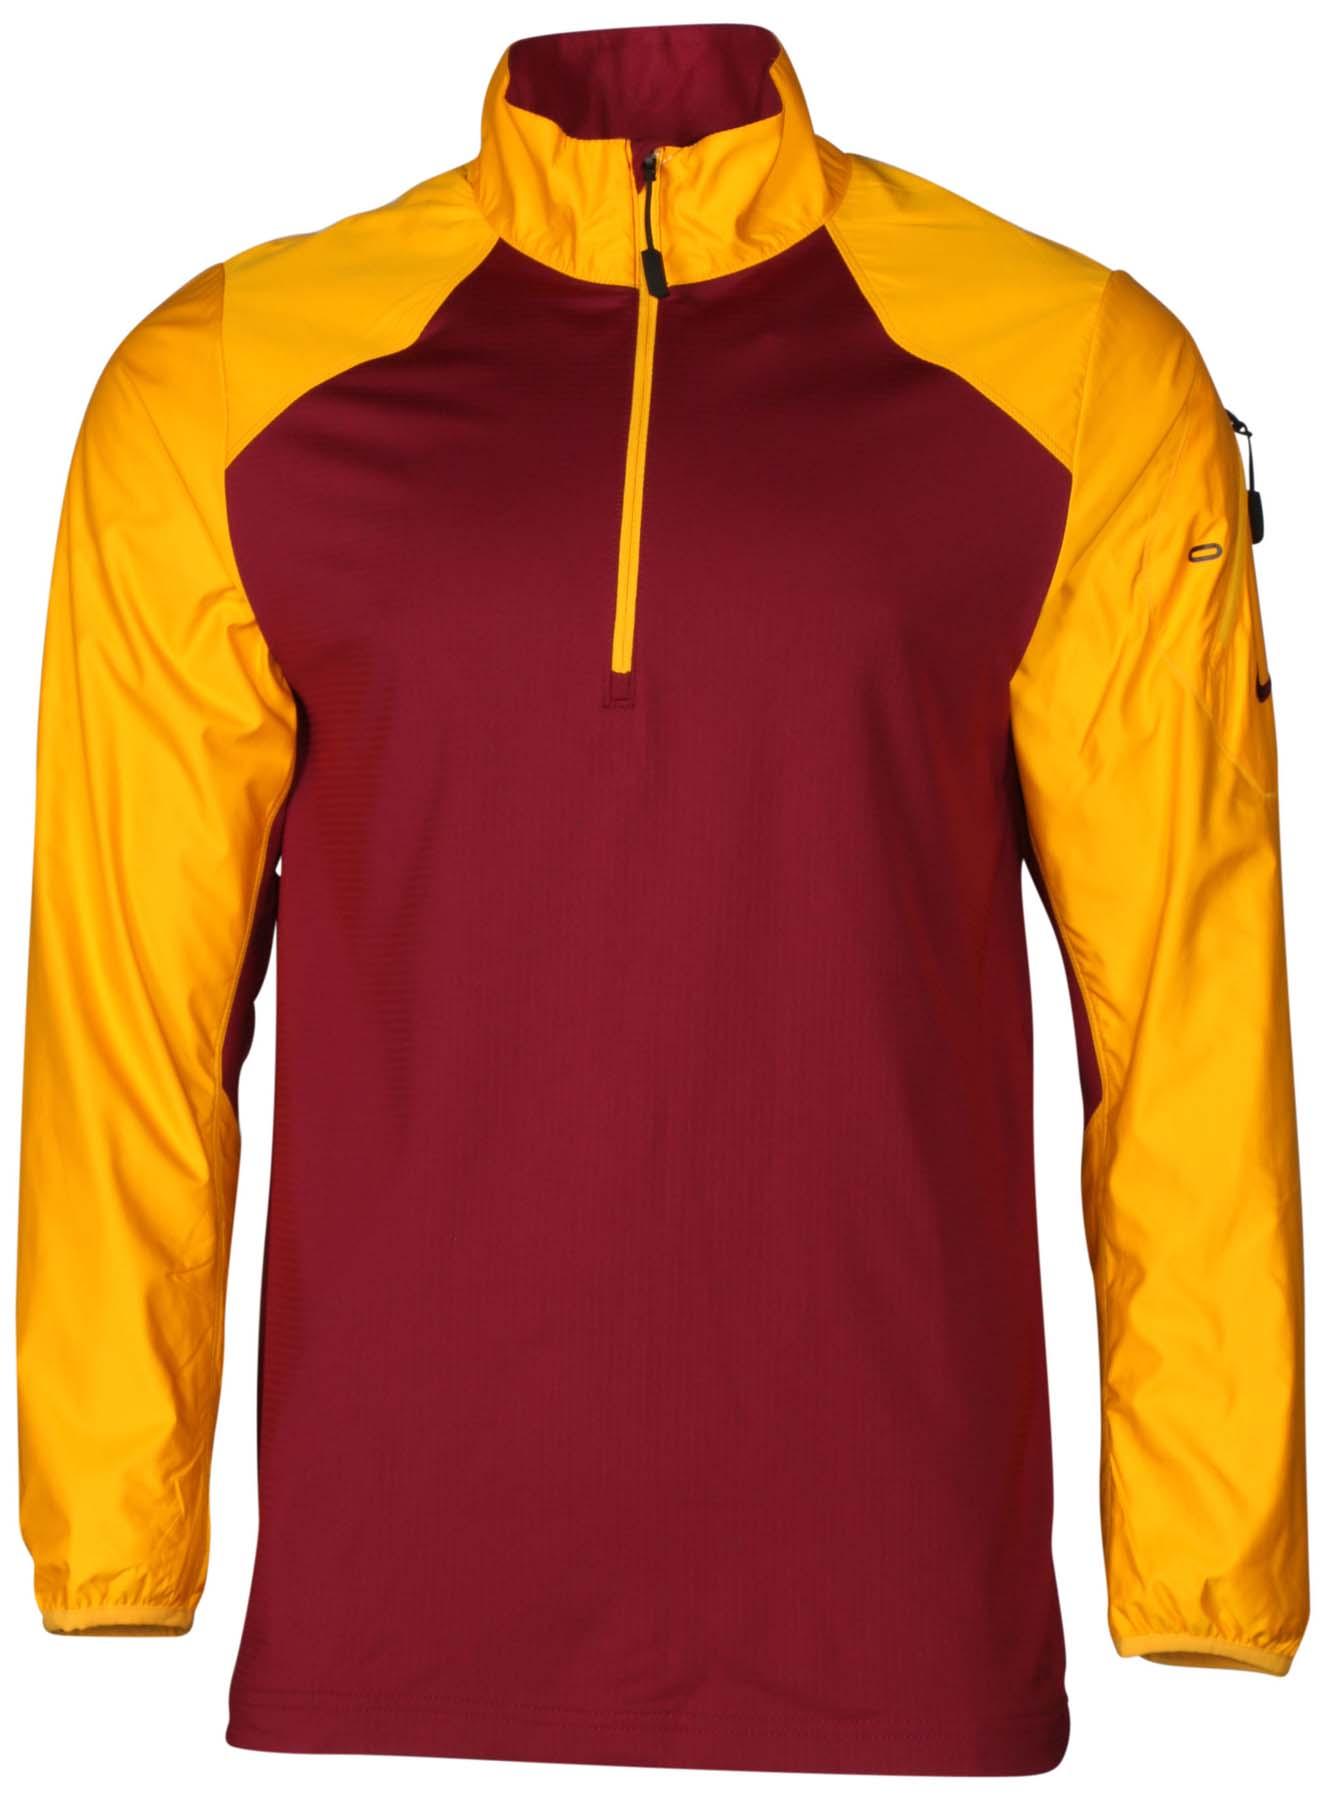 45ef3ae5 Nike Dri Fit Mock Neck Mens Golf Shirt